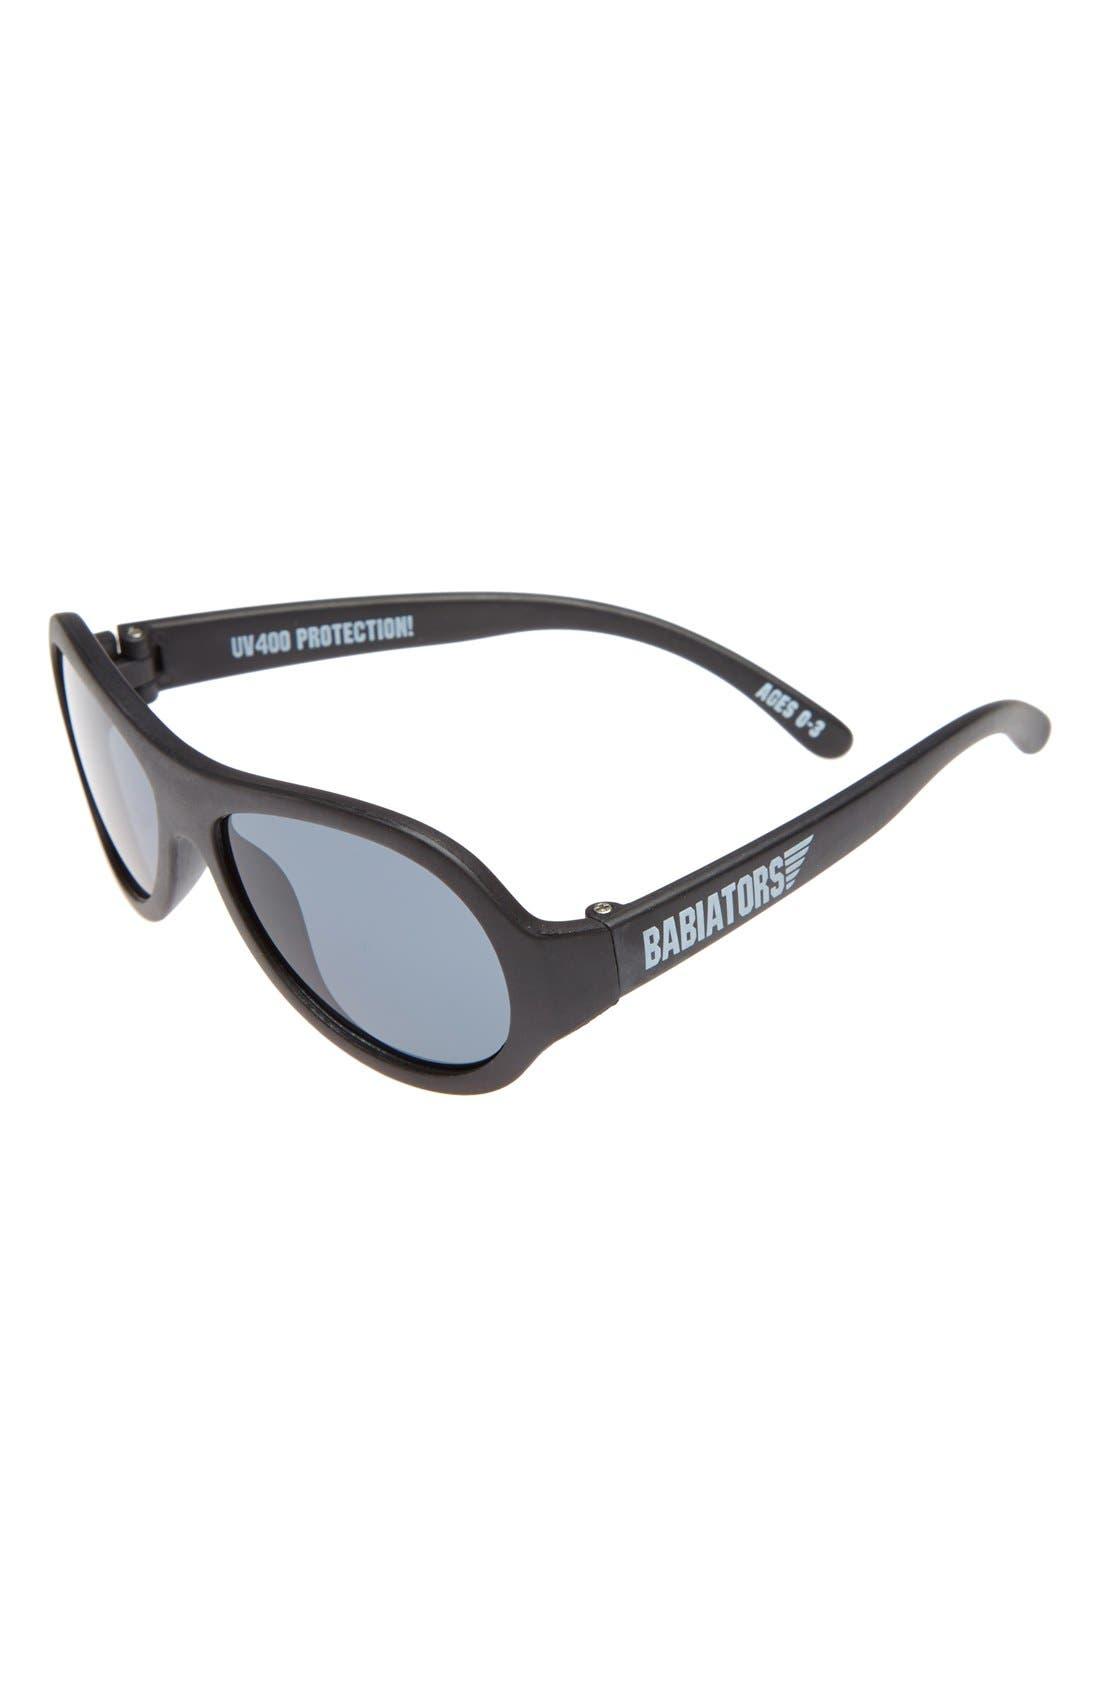 BABIATORS 'Junior Babiators' Sunglasses, Main, color, BLACK